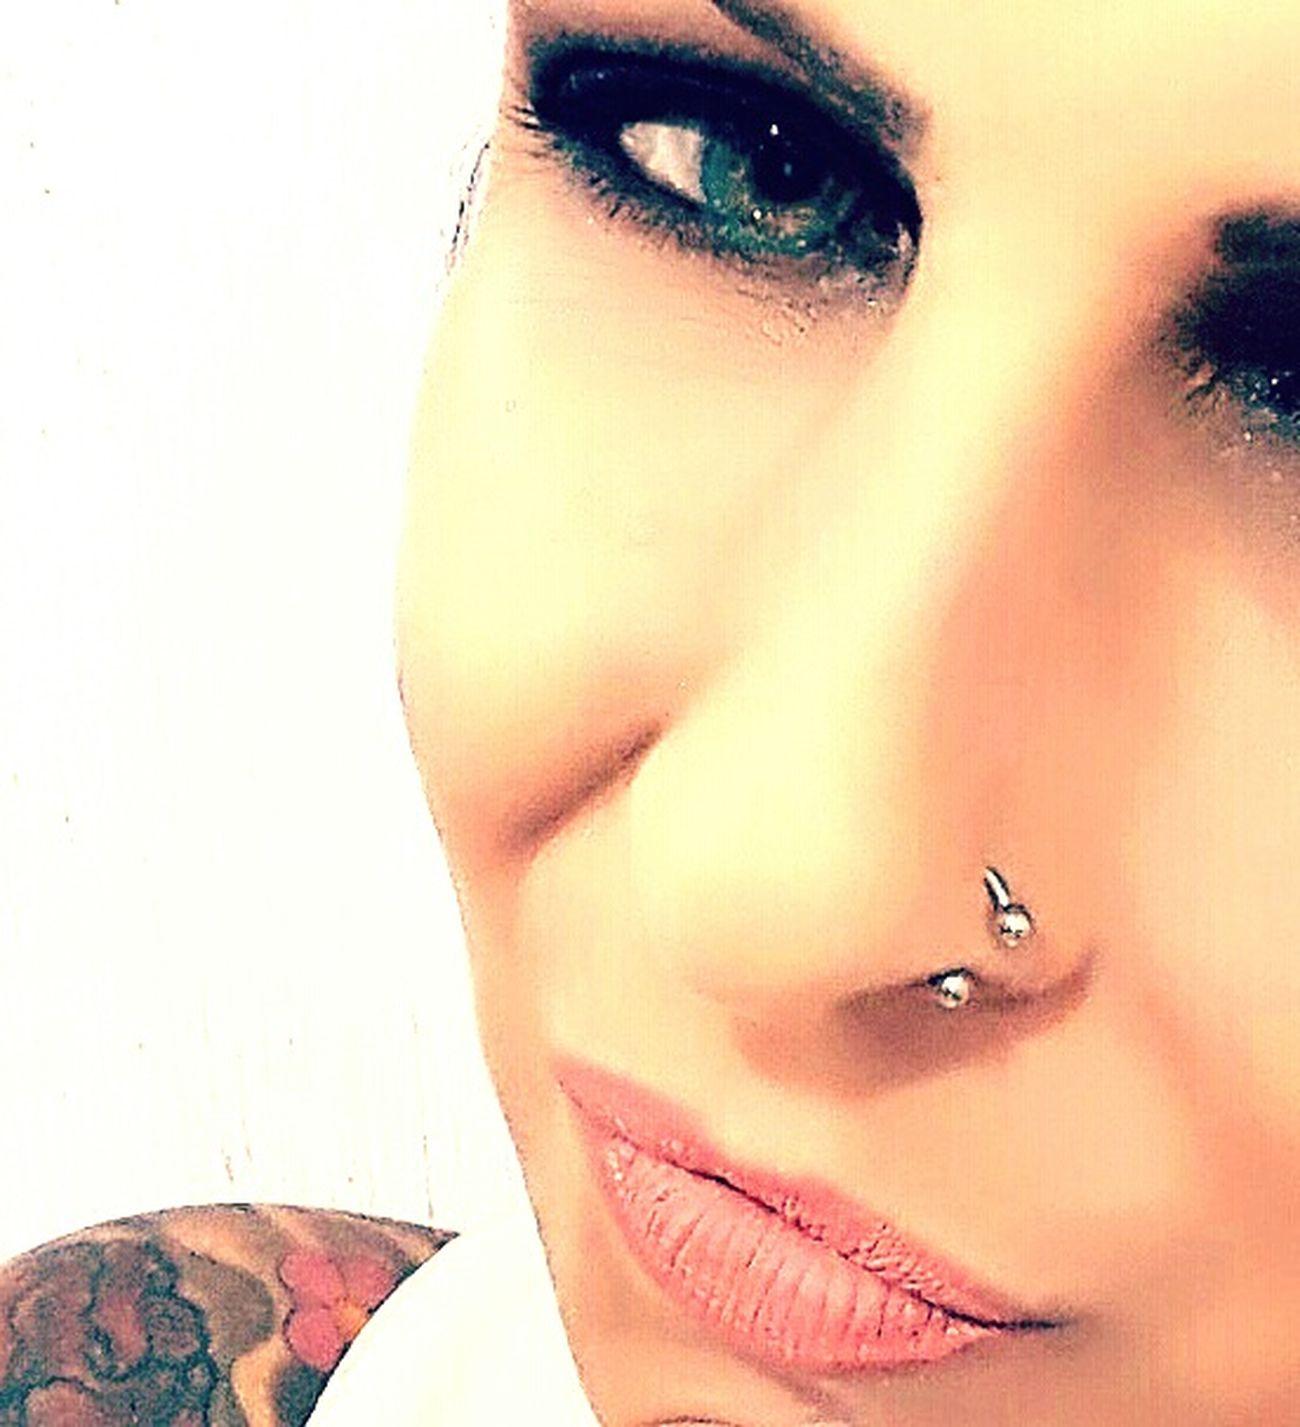 Myface Myeyes Eyegreen Deep Make-up That's Me Outdoors Portrait Rio De Janeiro, Brazil